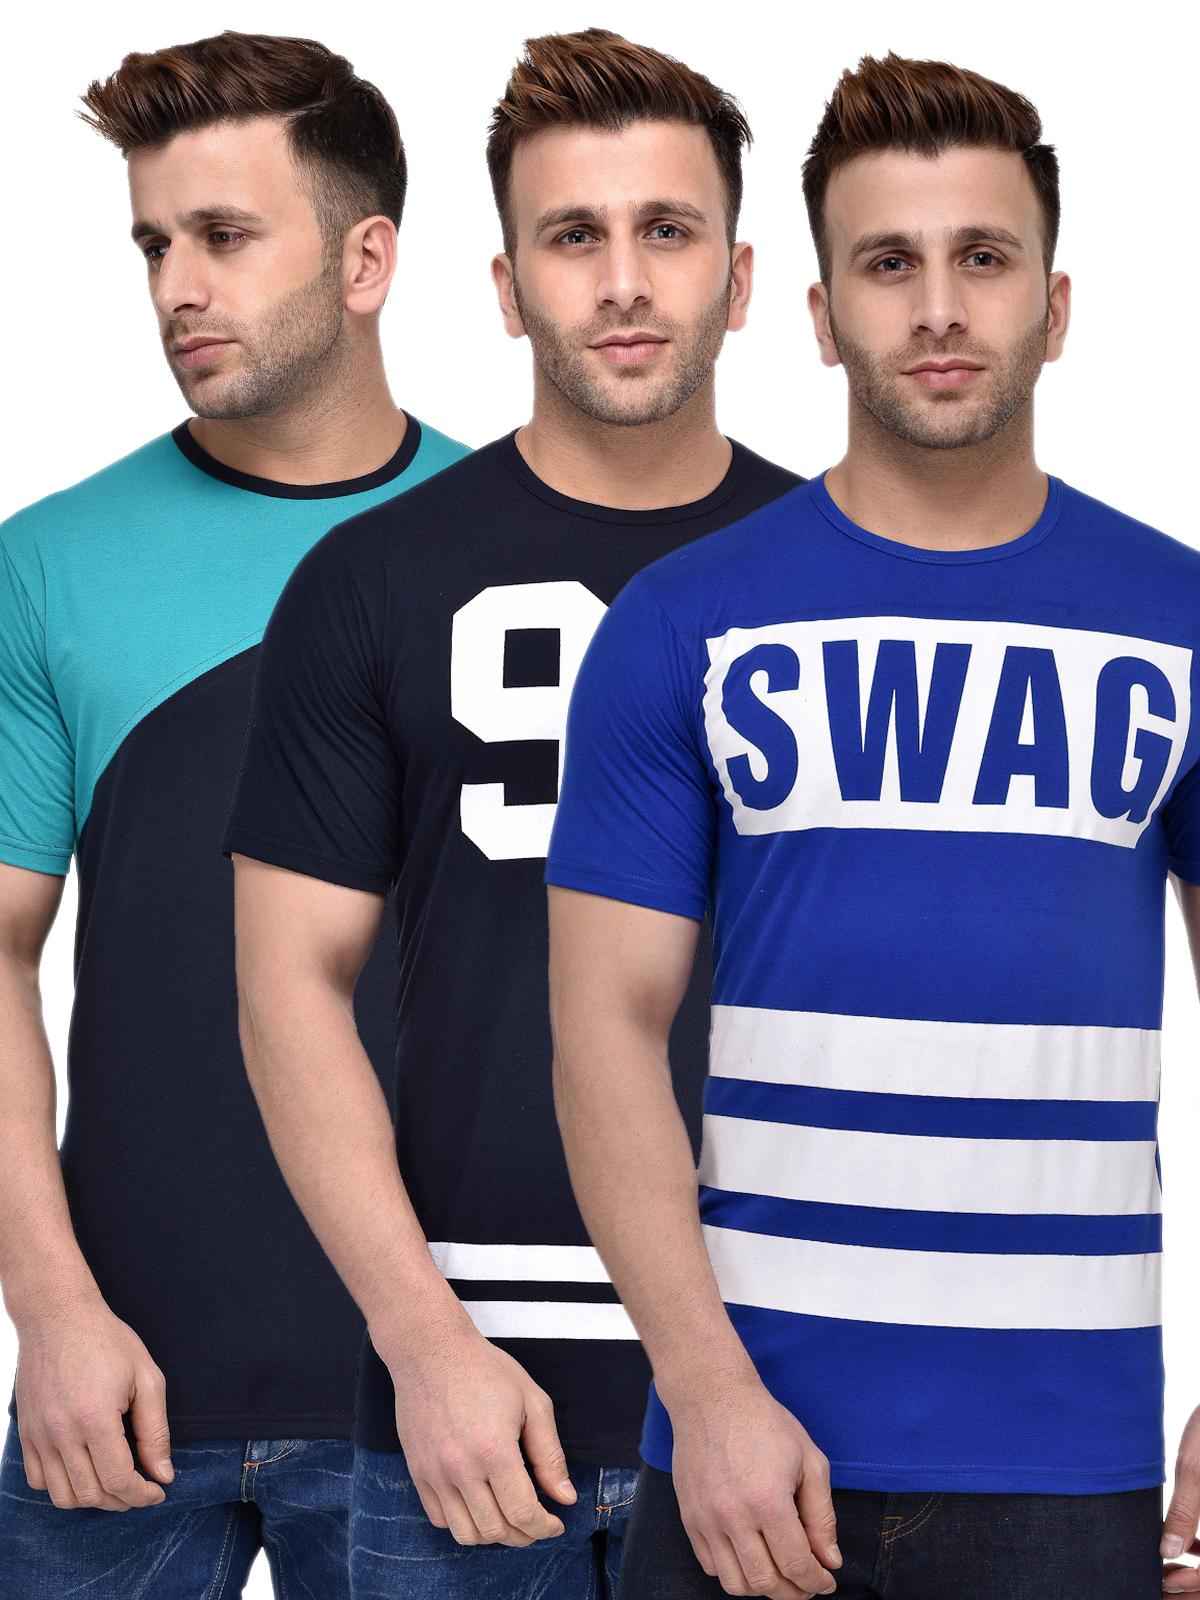 leemarc Lee Marc Men's Solid Casual T Shirt 3combo_t-shirt_swag96navygreen